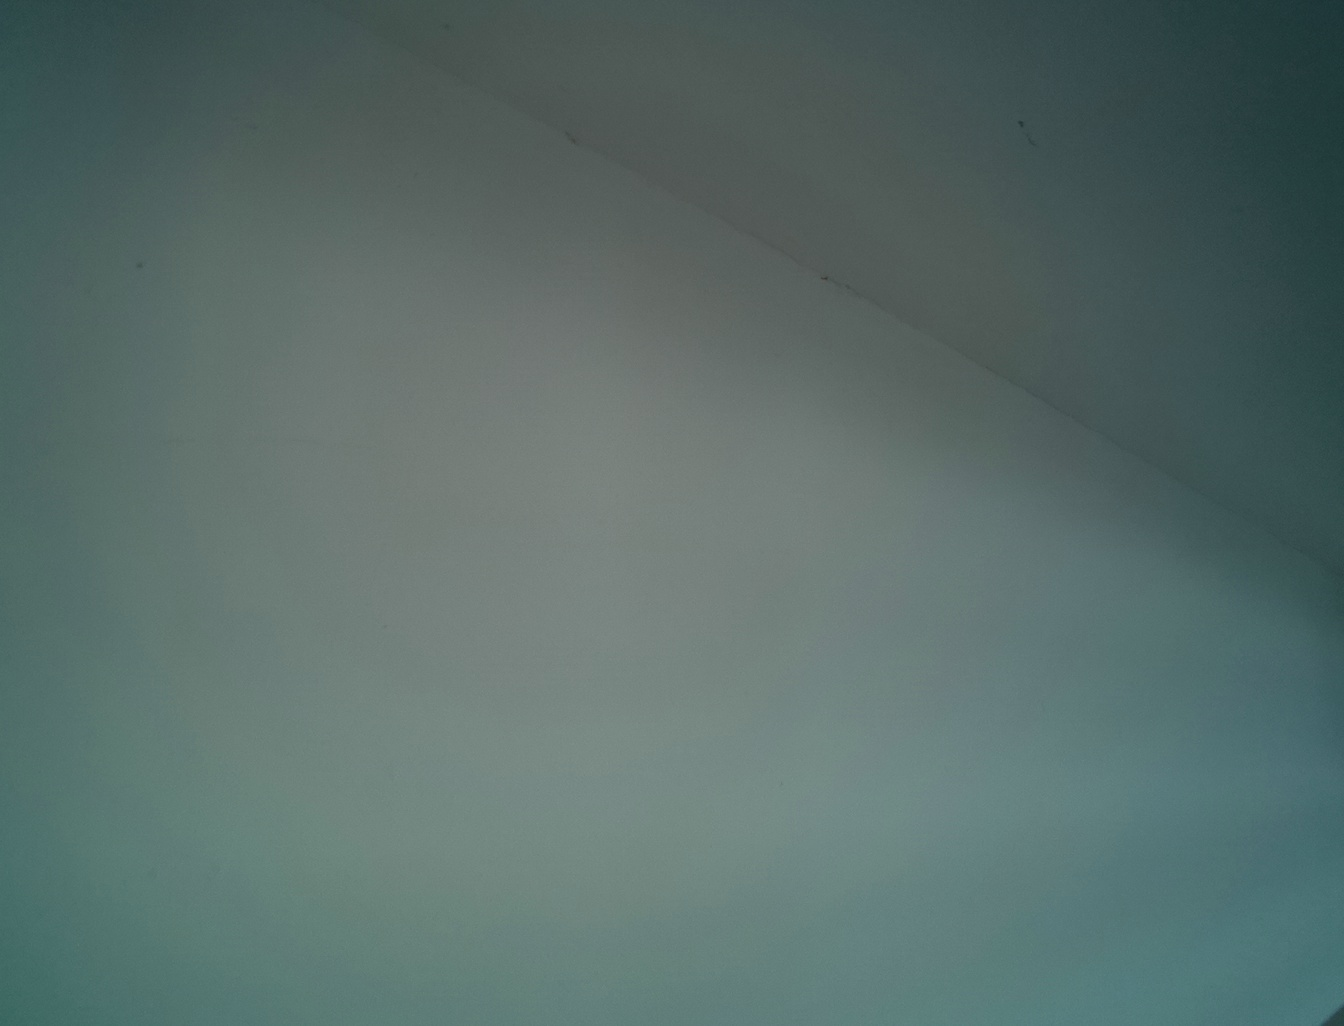 camera1-2021-09-04-13-00-16